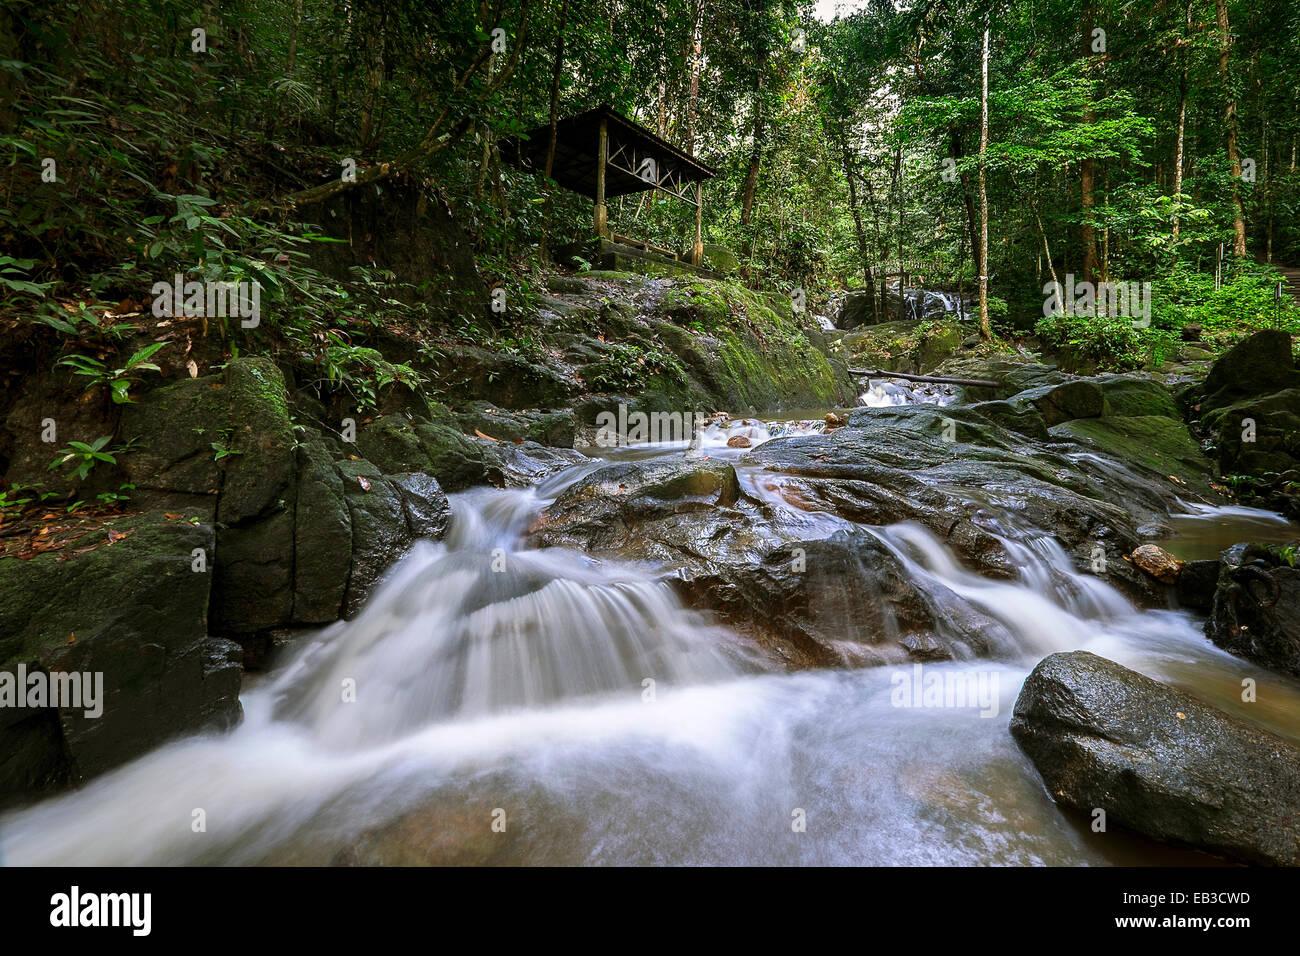 Malaysia, Selangor Stato, Semenyih, Sungai Tekala foresta ricreativa, fiume di montagna Immagini Stock